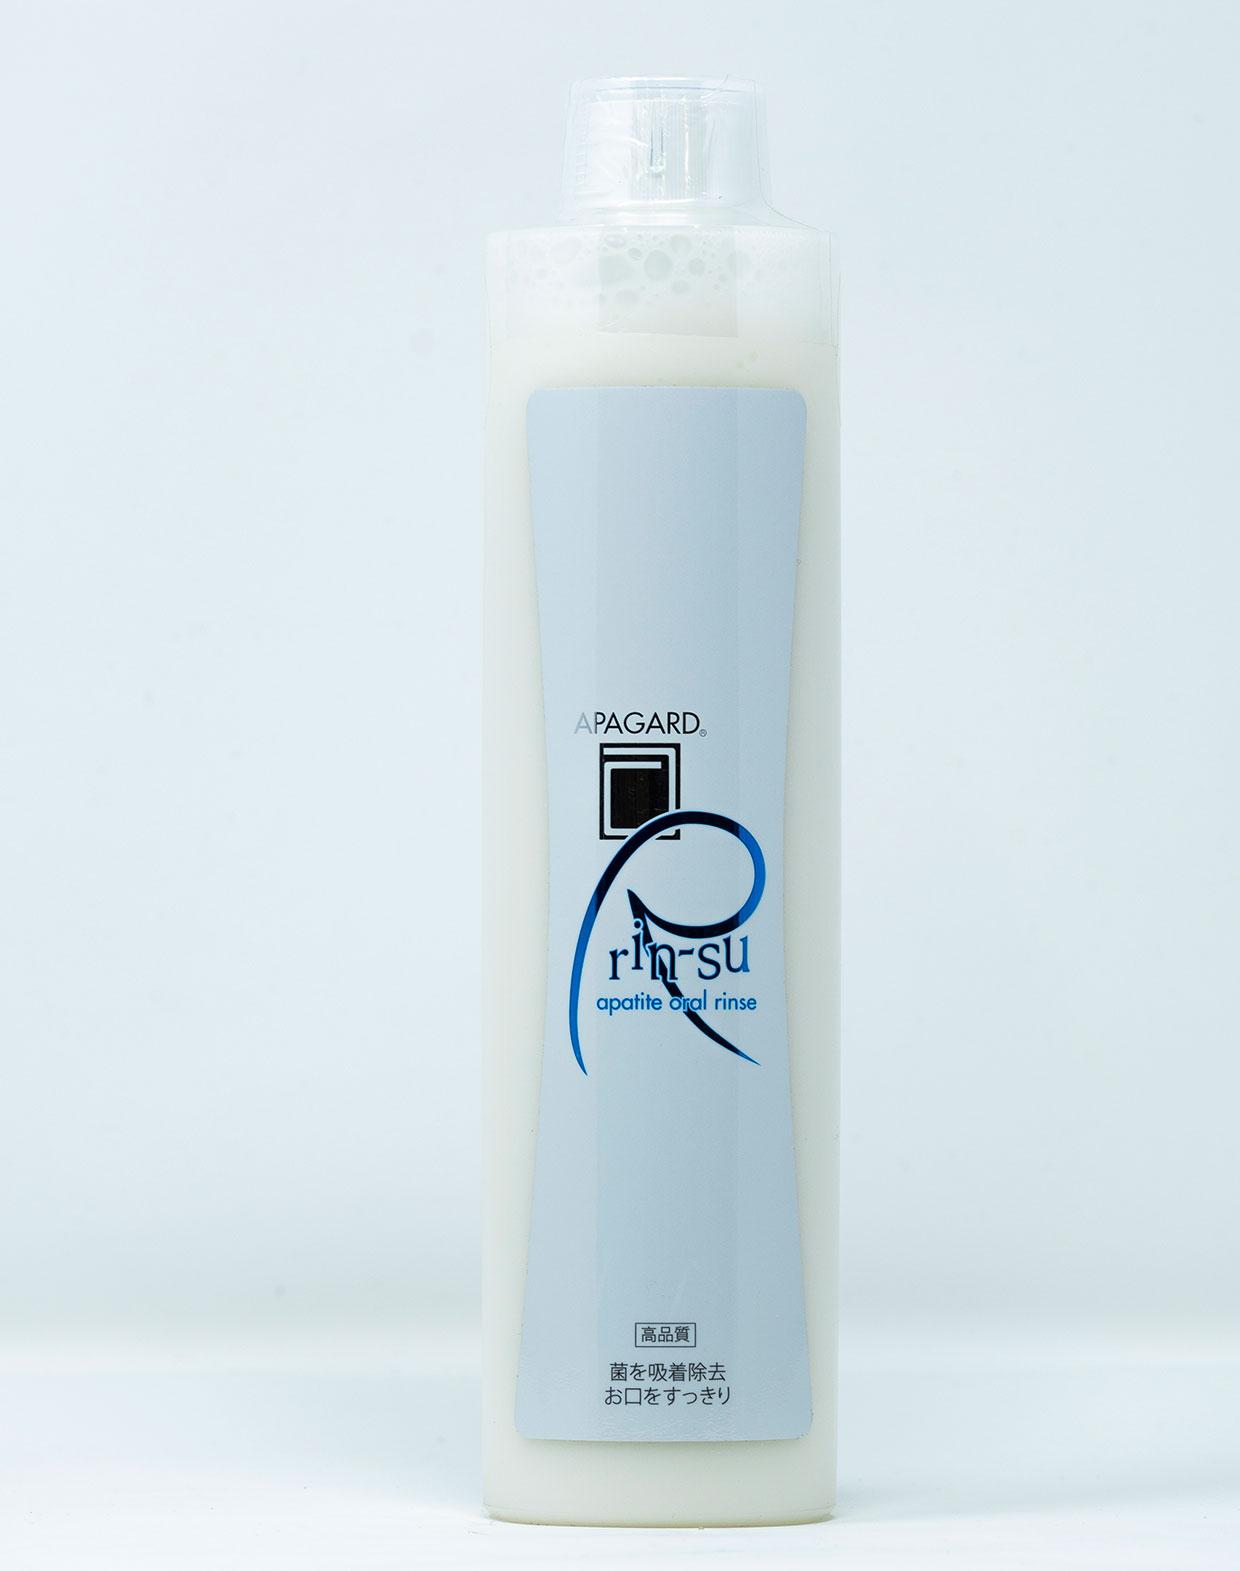 Apagard Collutorio Rin-Su - 380 ml